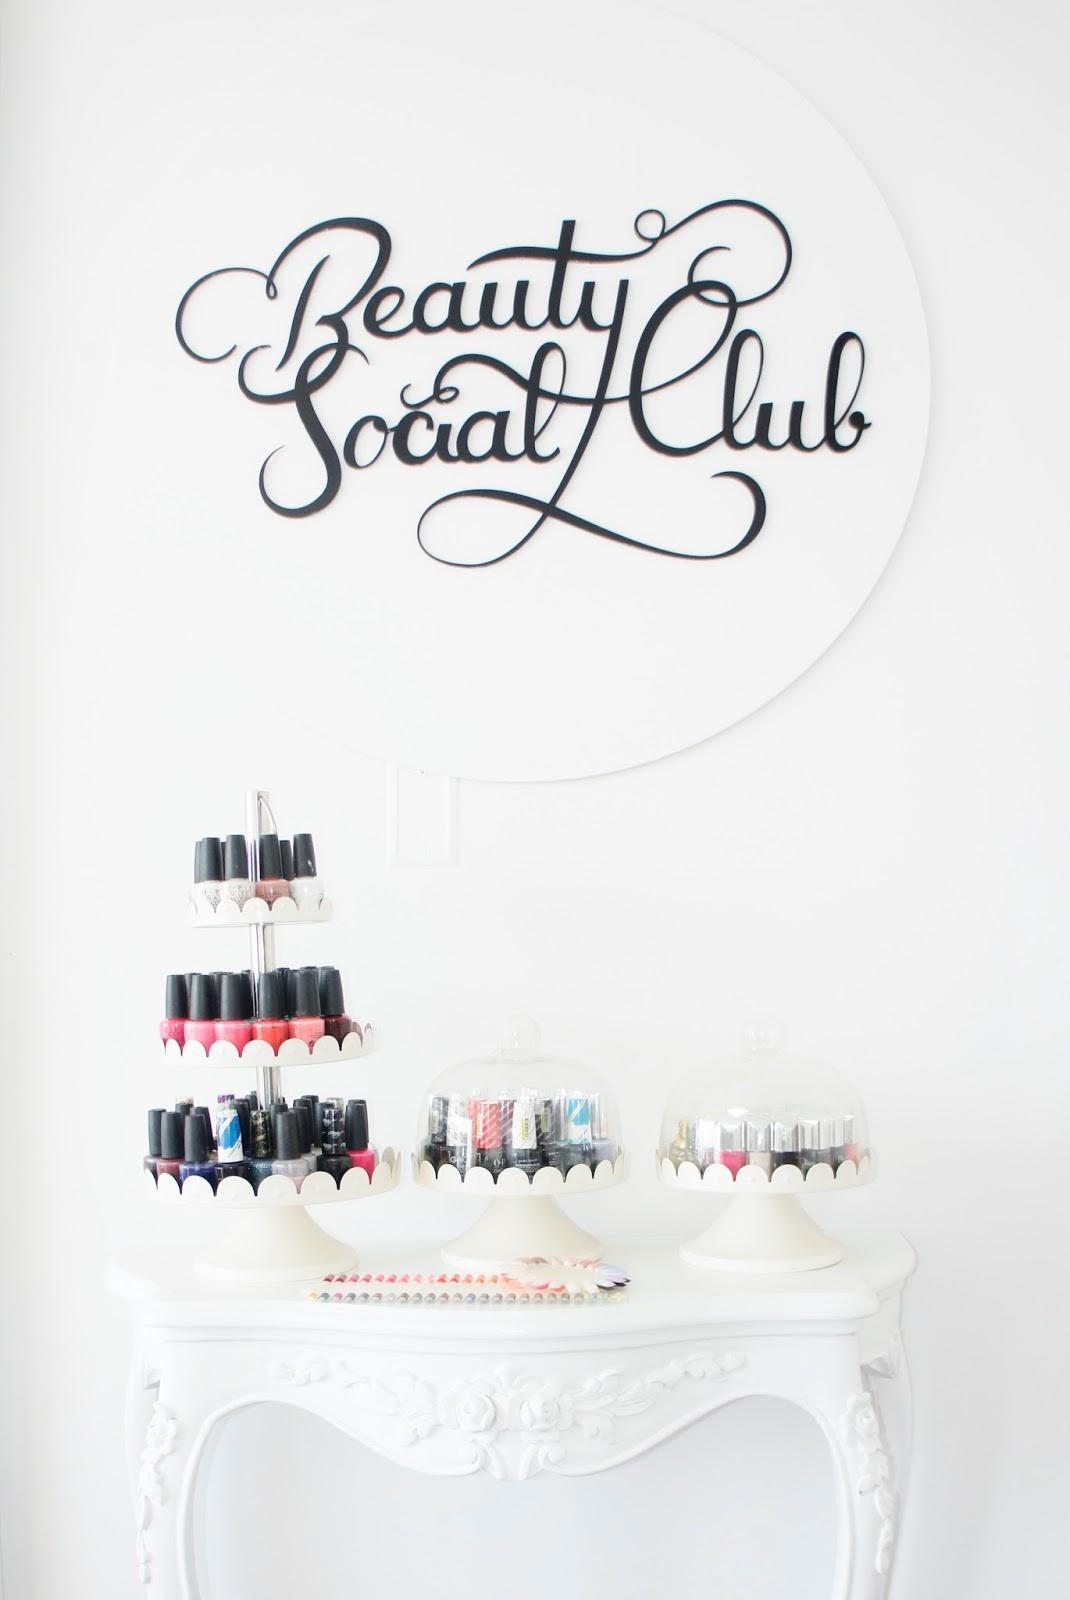 Beauty Social Club